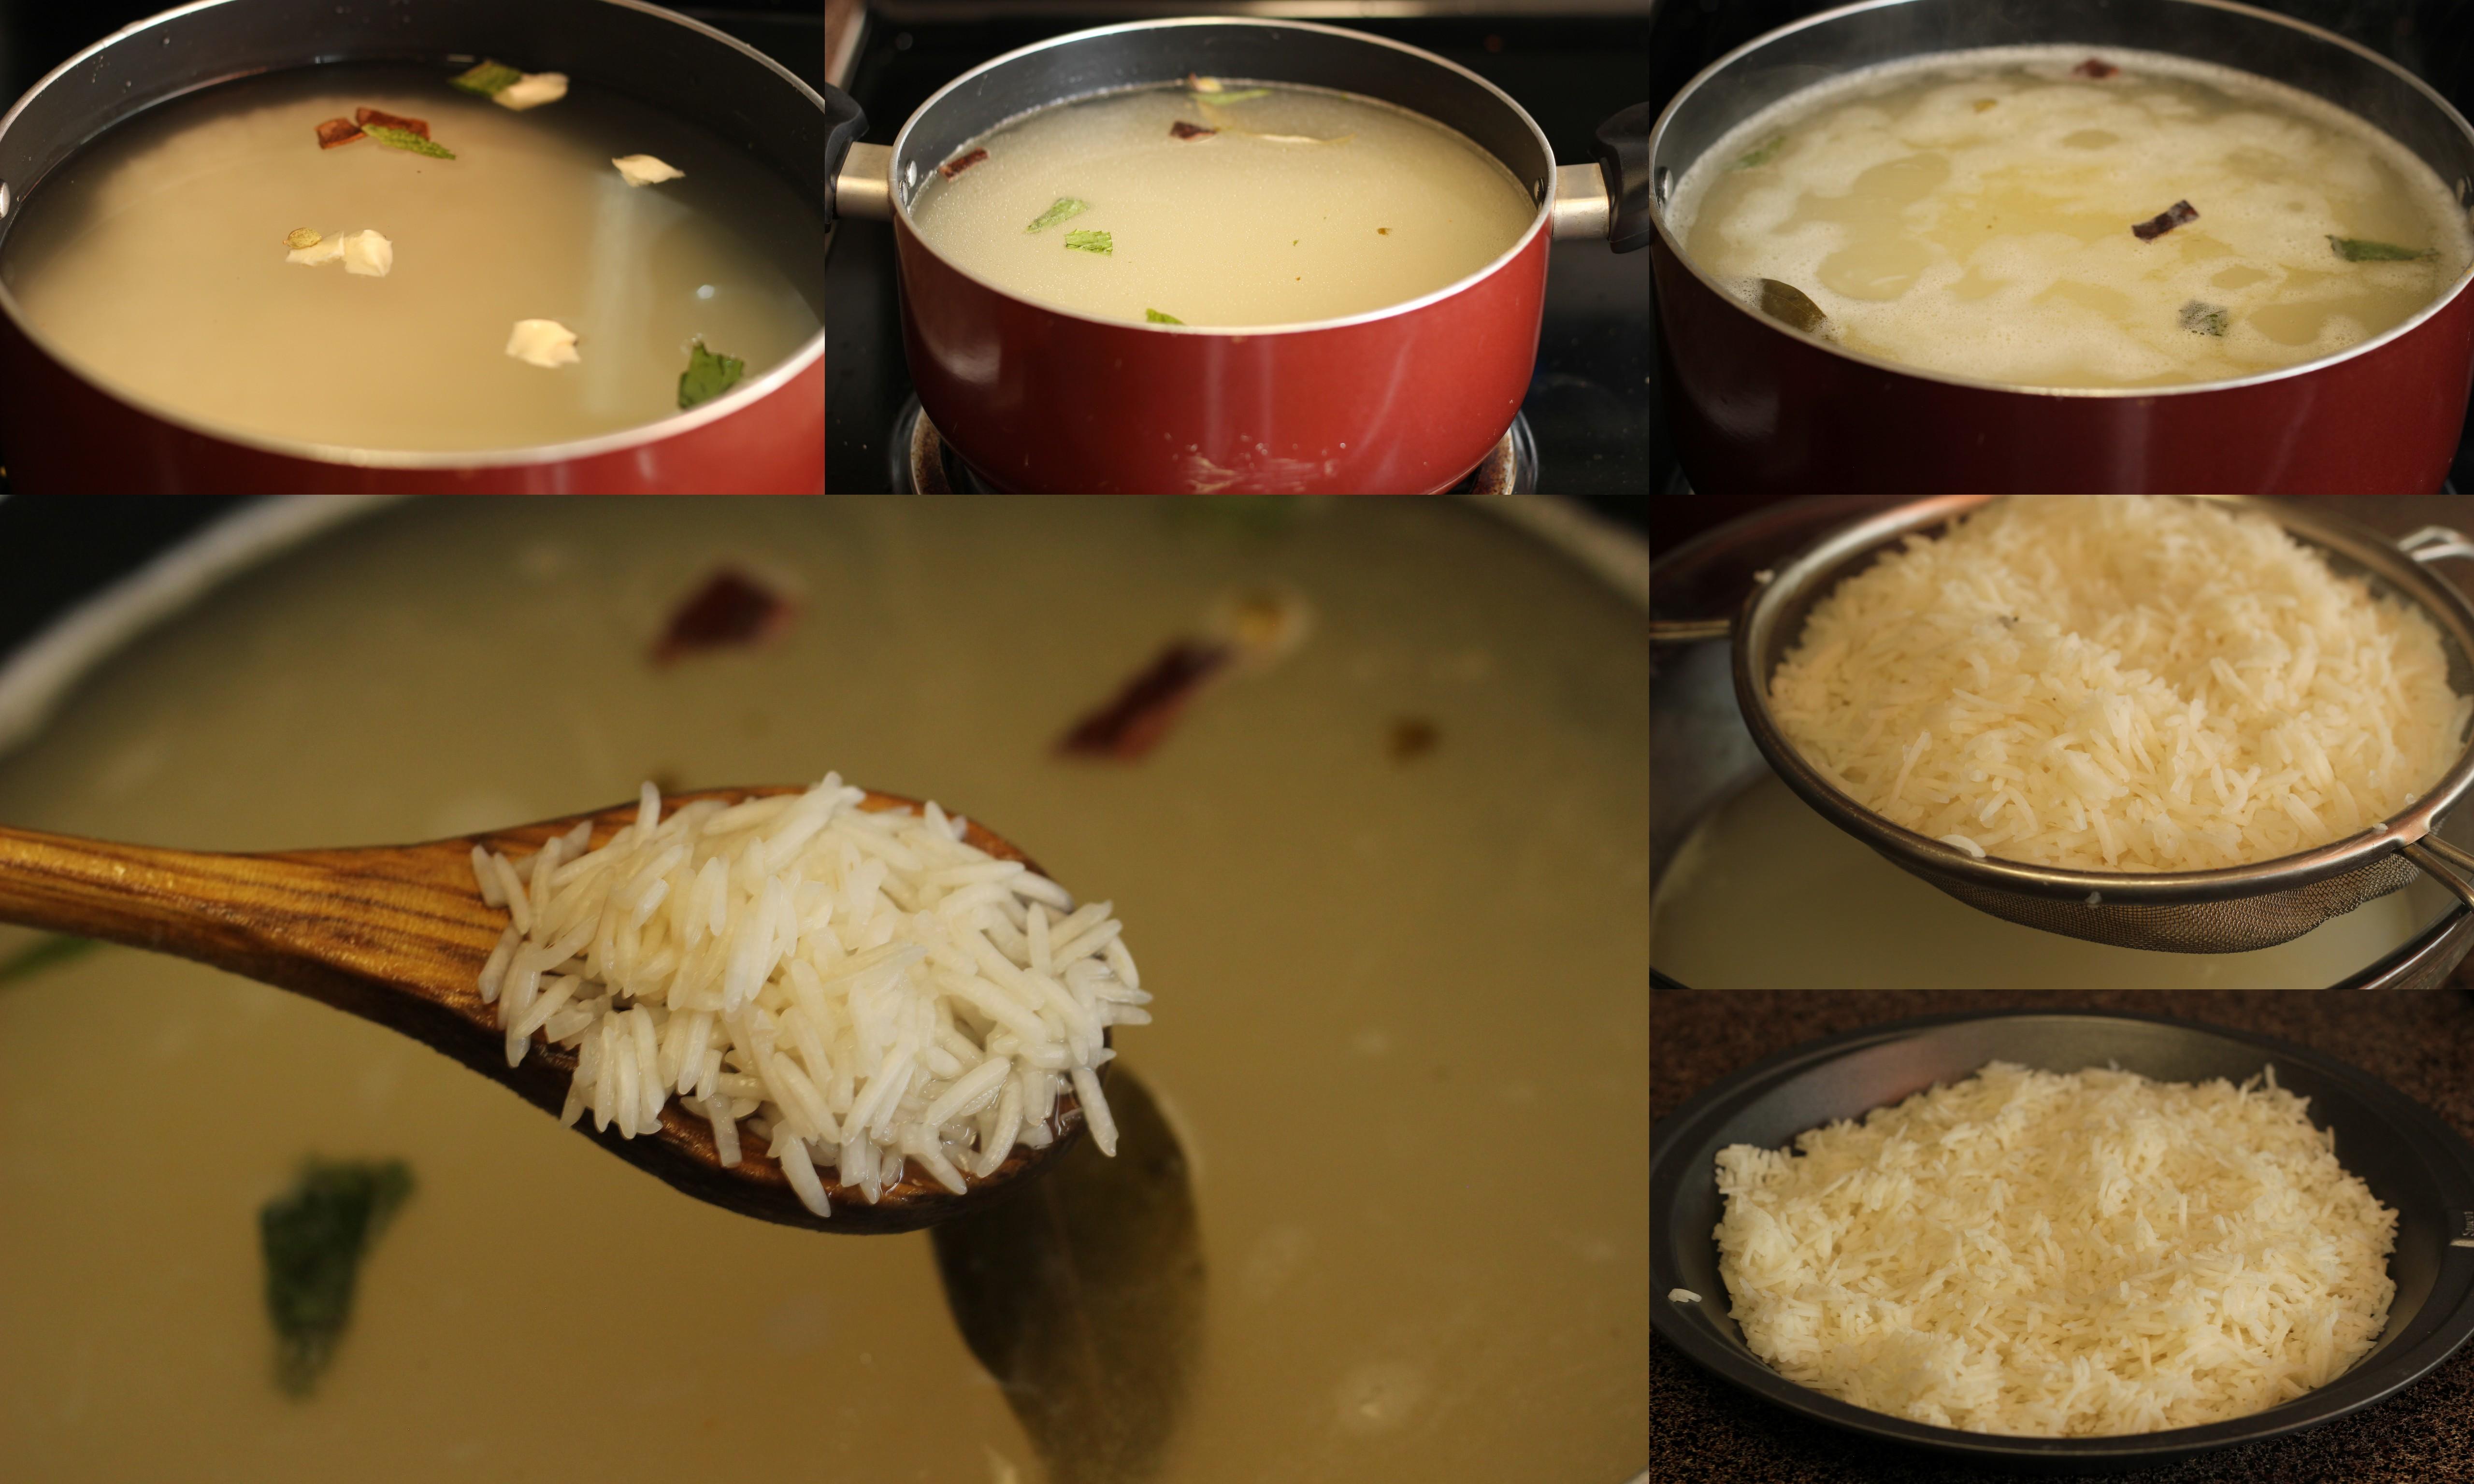 Chickenbiryanistepbysteppicturesmakingrice Niya's World: Rice Cooked In  Chicken Stock